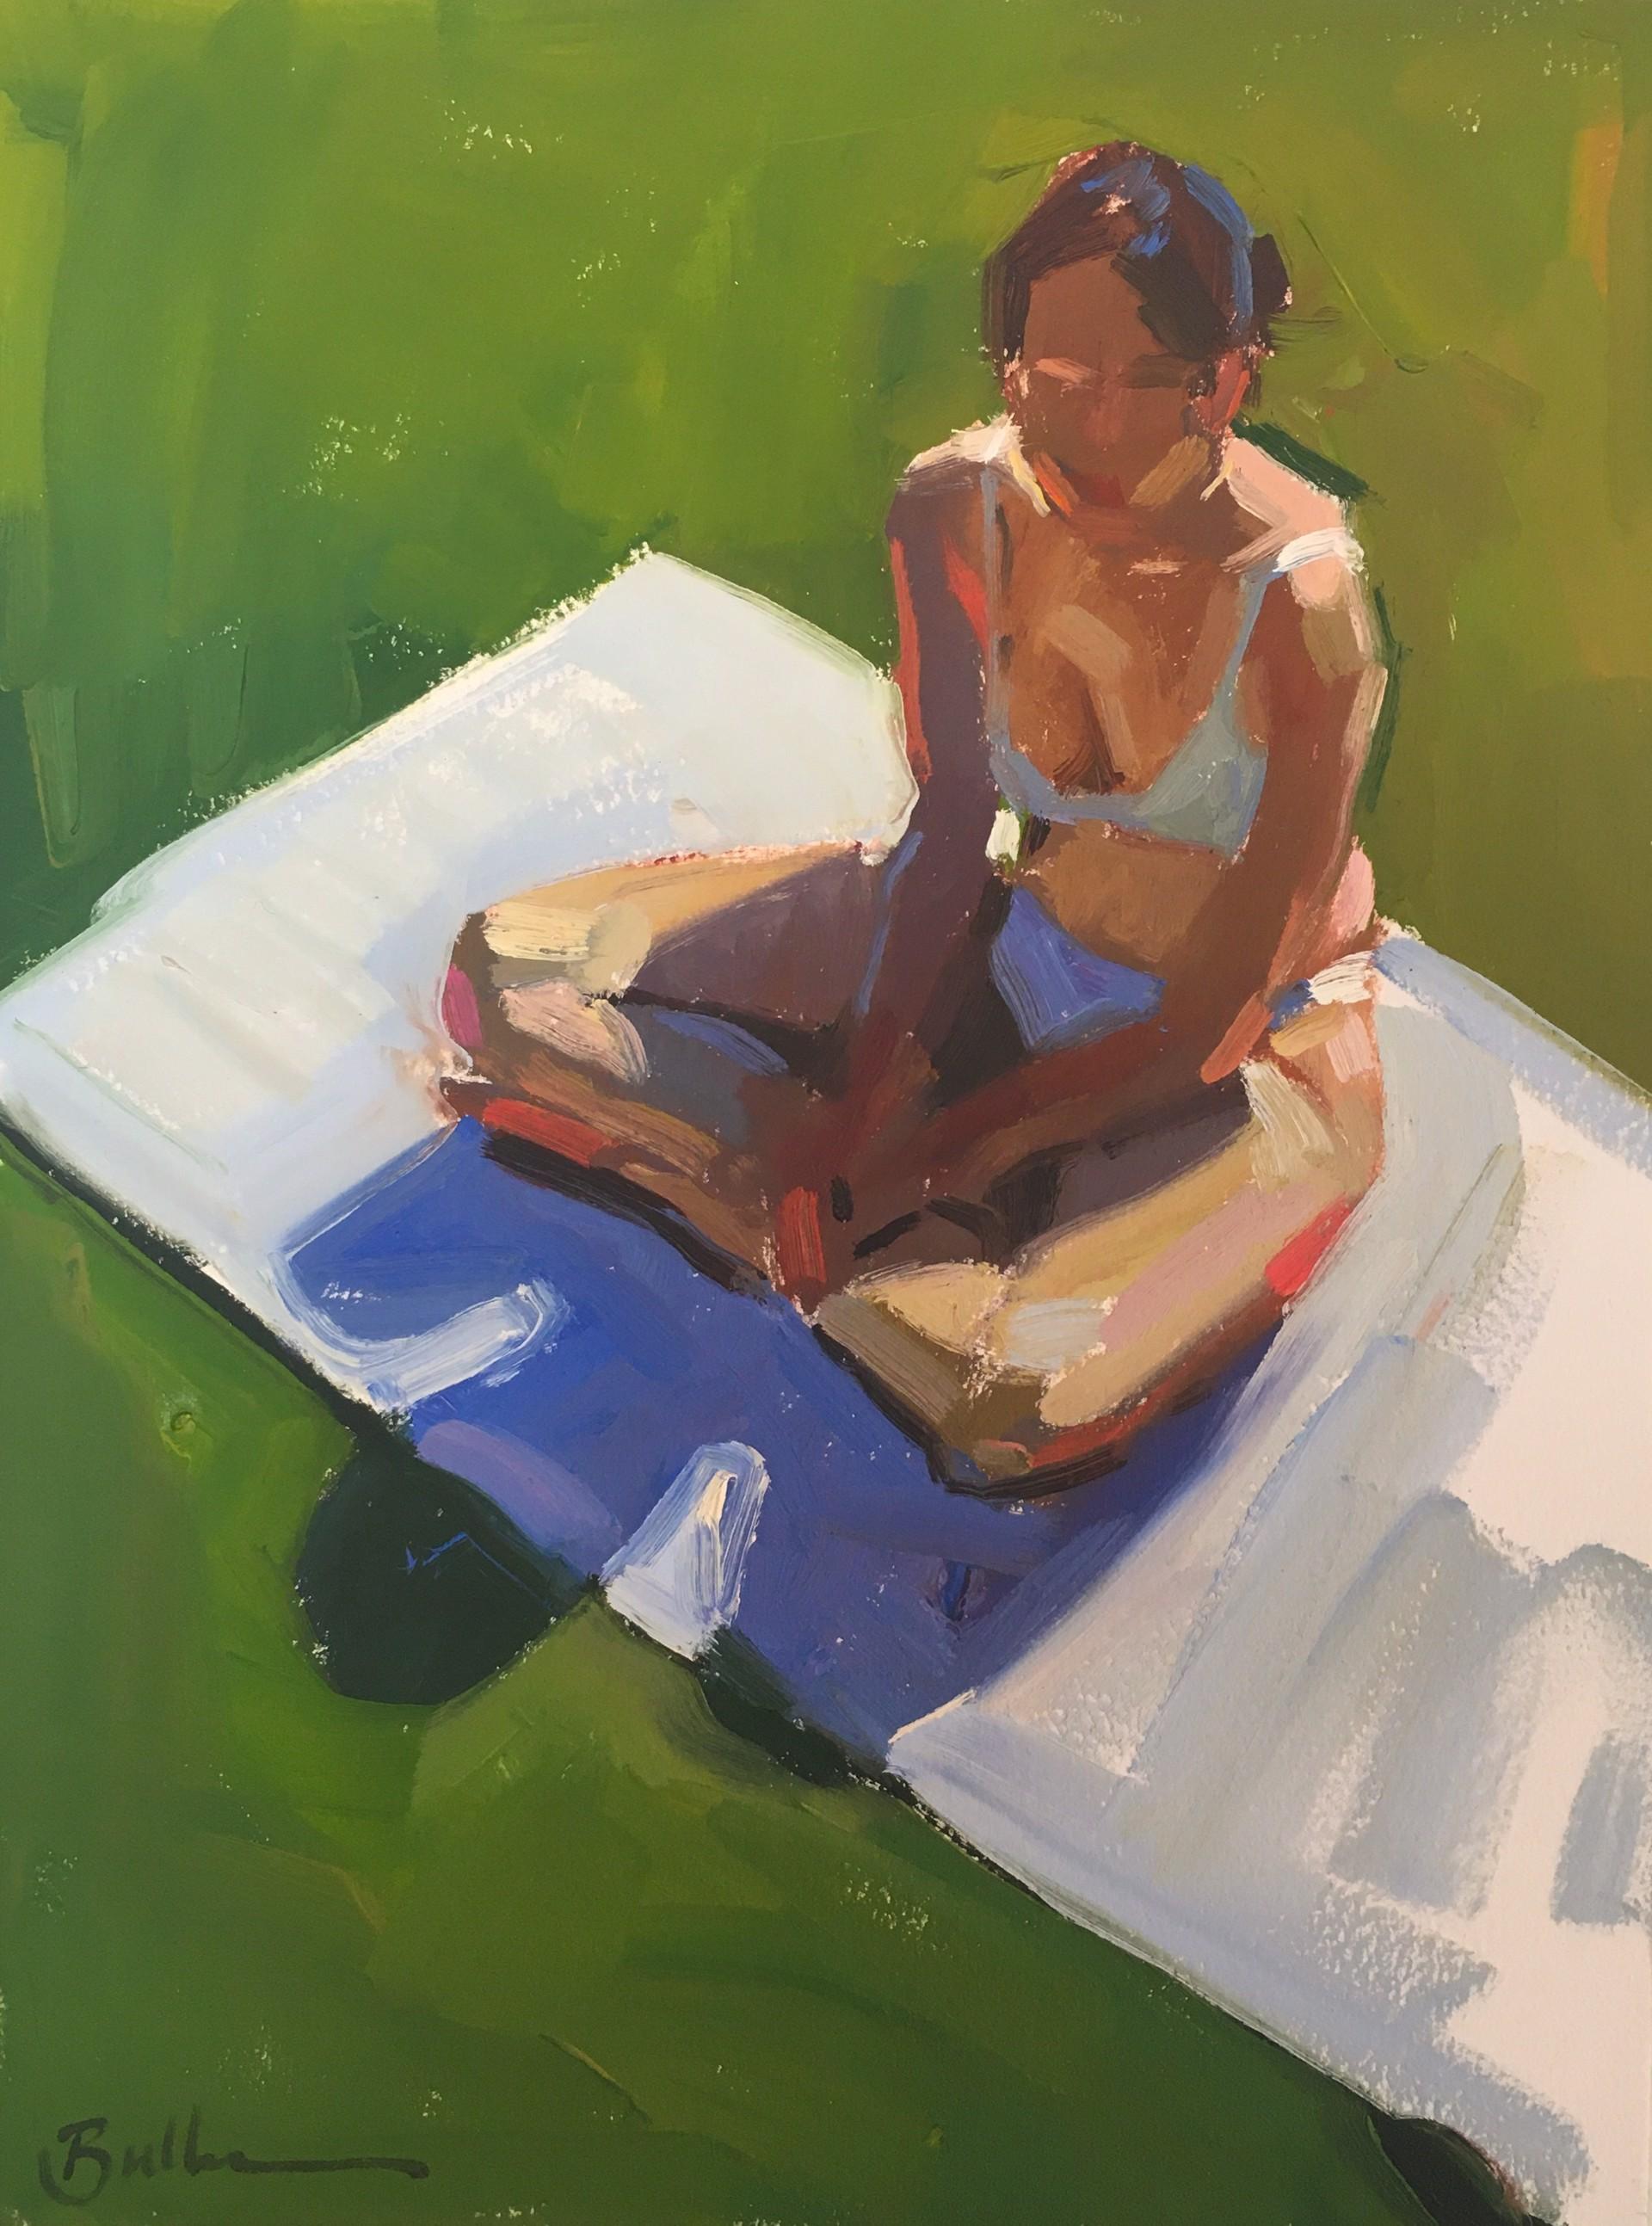 Warming Her Back by Samantha Buller